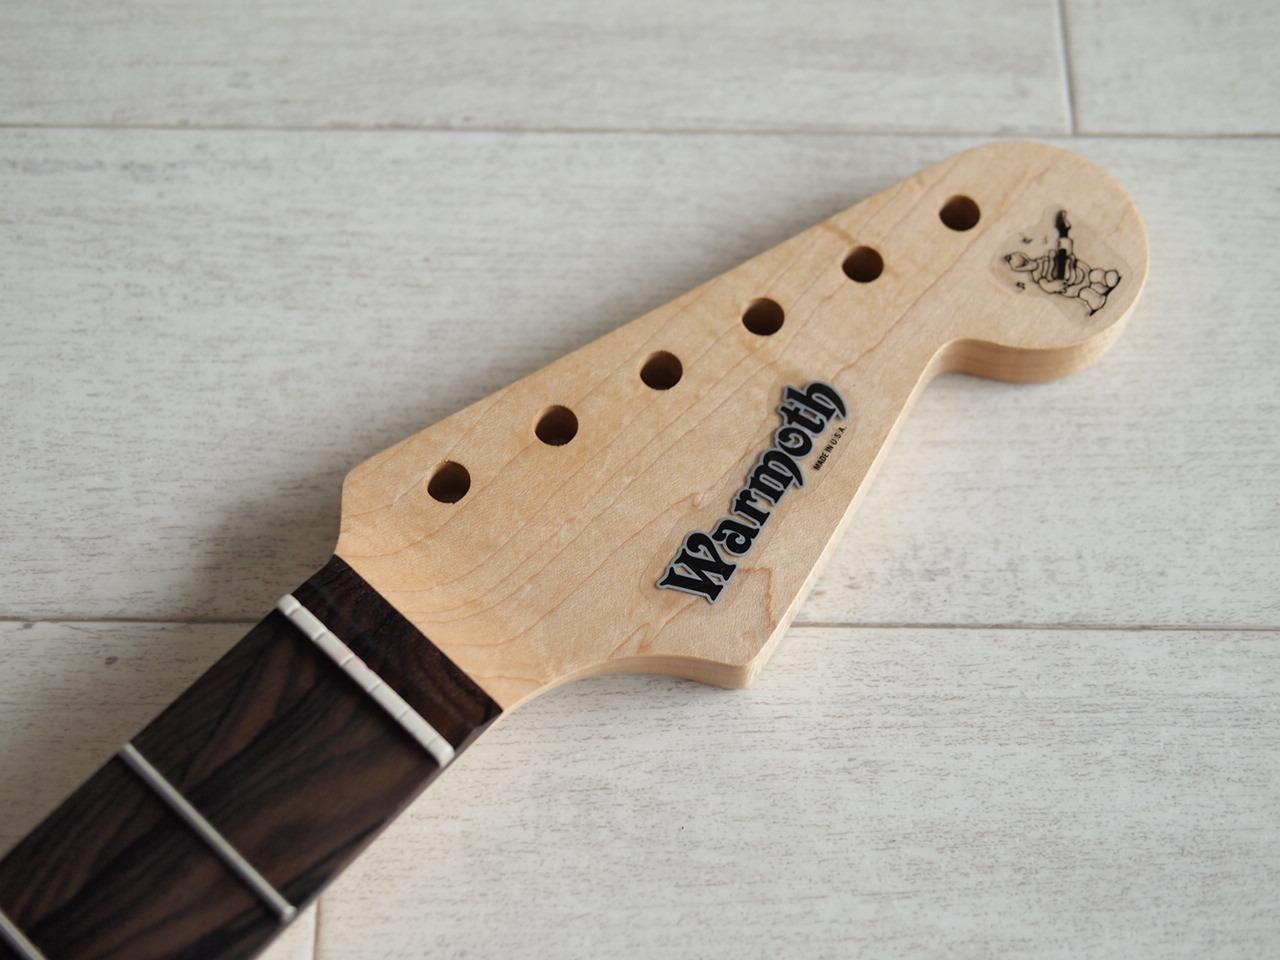 WARMOTH Stratocaster Neck - Maple/Figured Ziricote - Modern